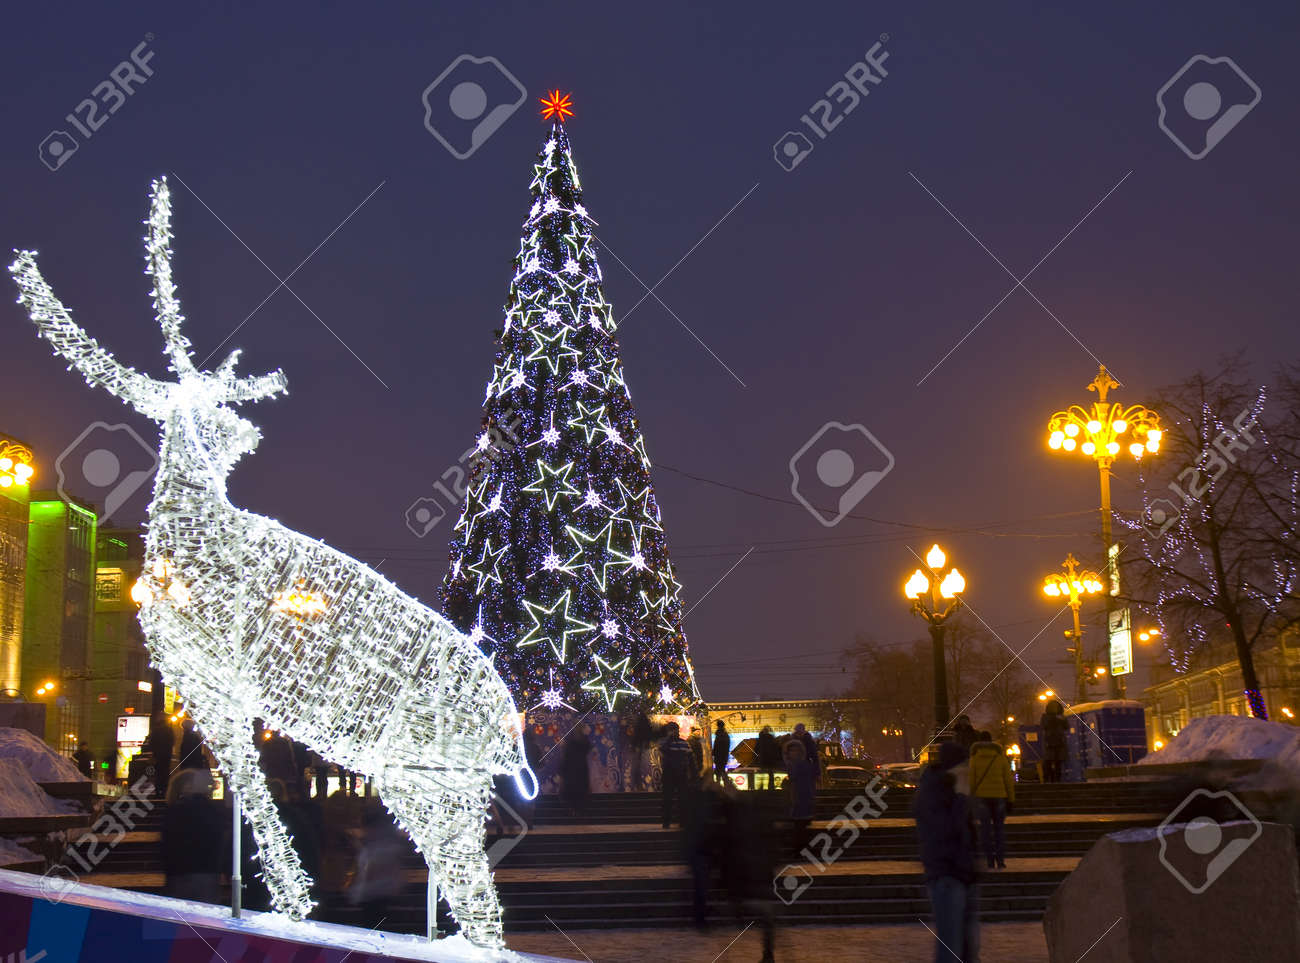 Weihnachten Am 6 Januar.Stock Photo